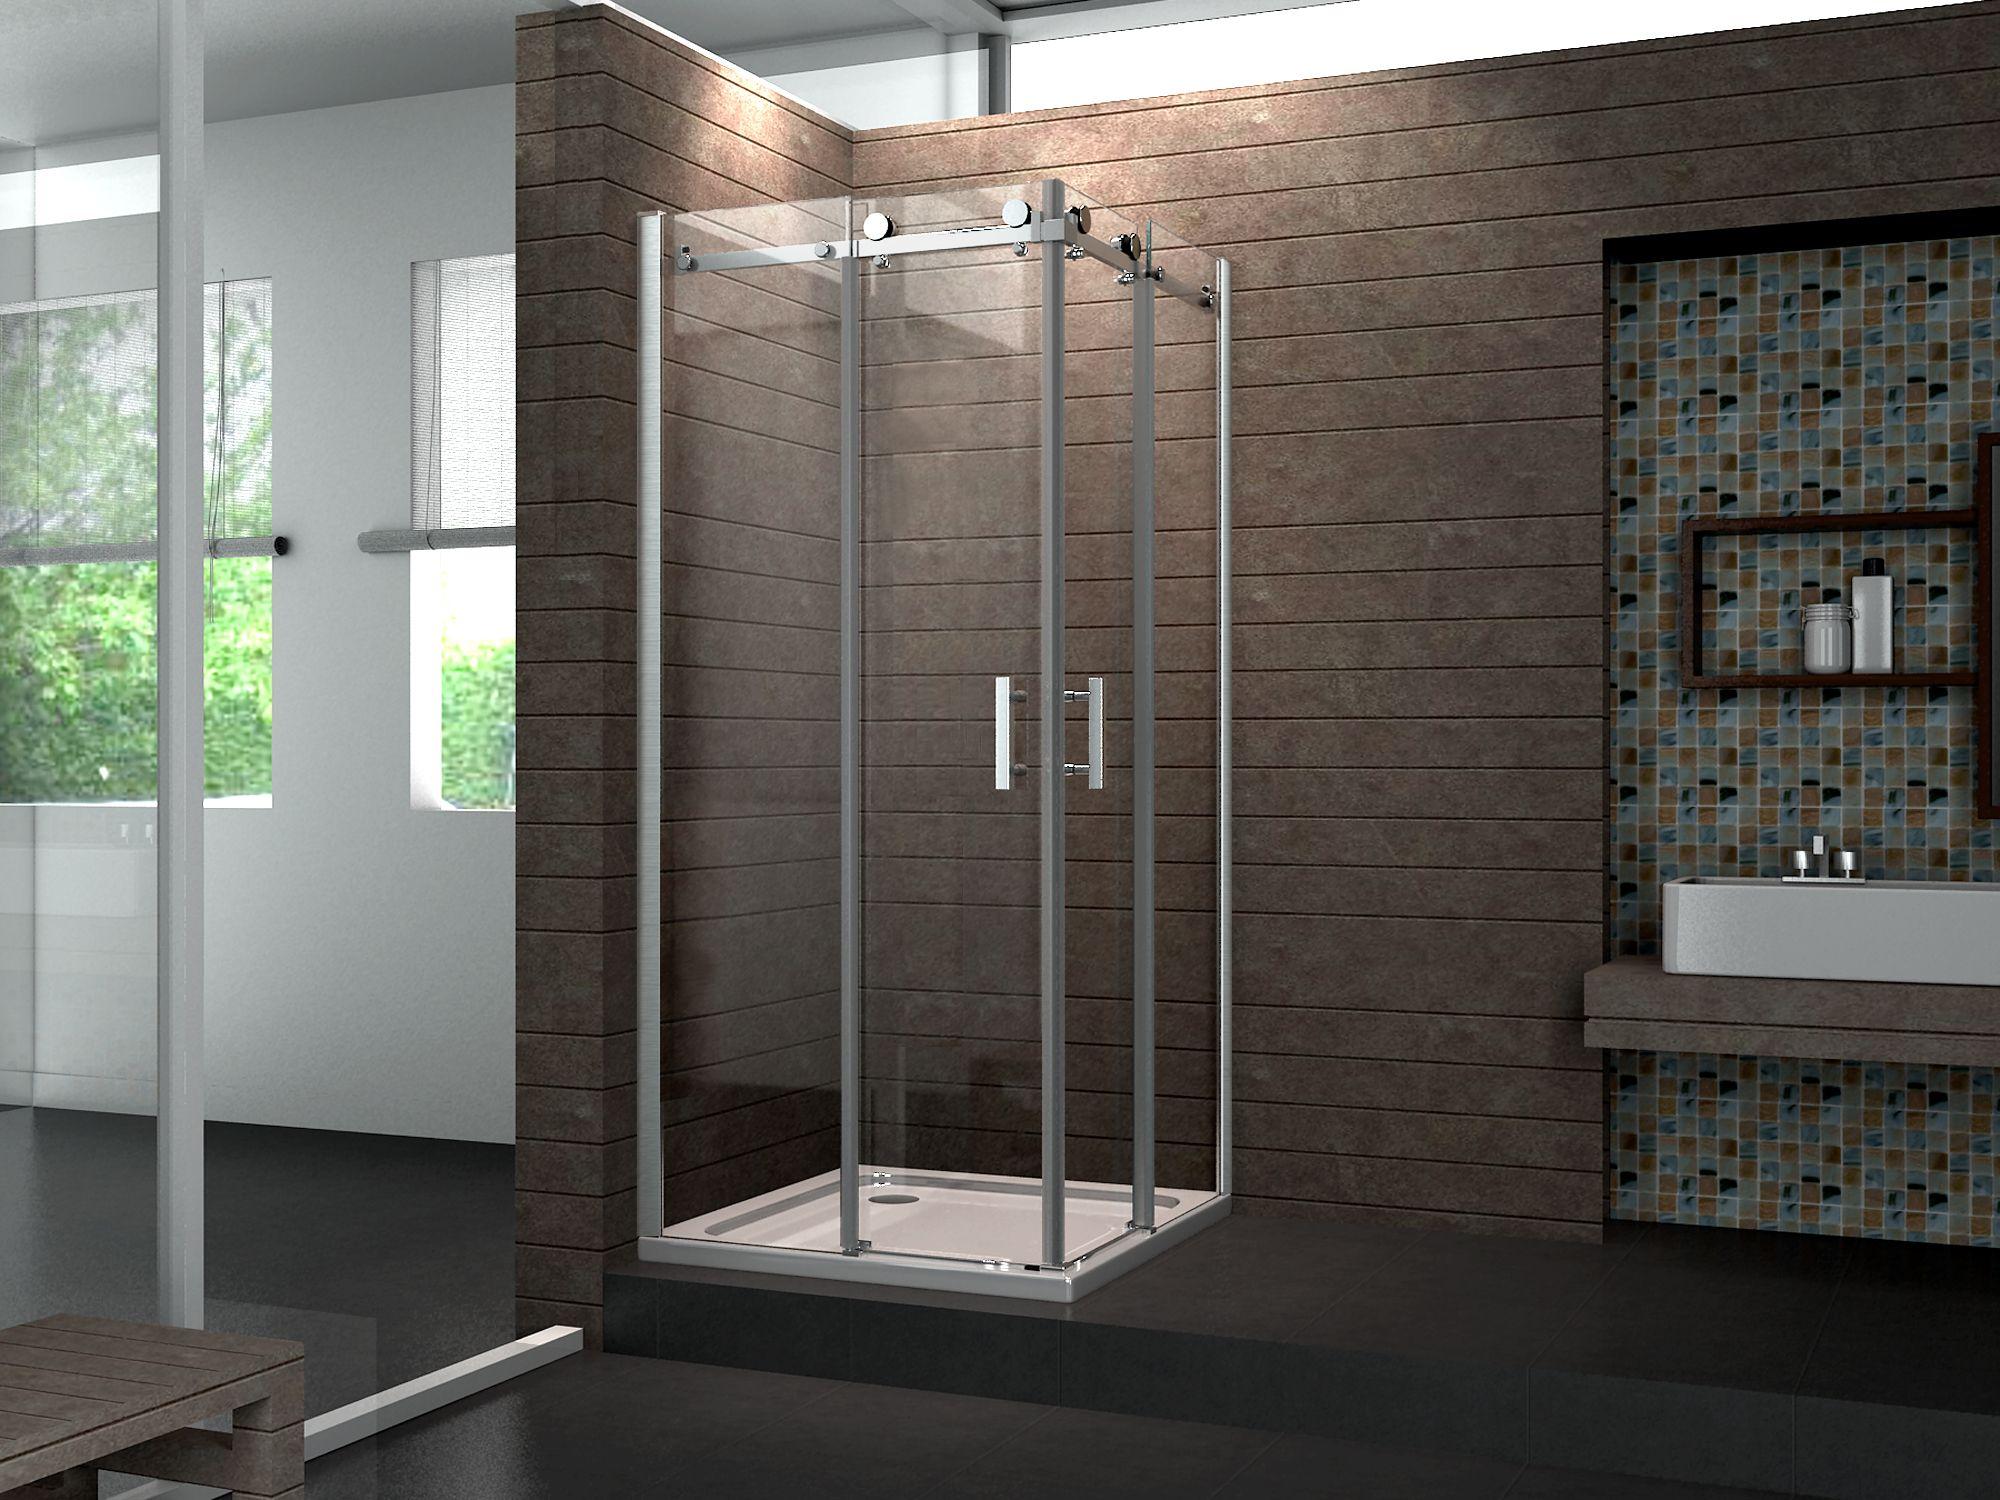 Duschkabine TELA 80 x 90 x 195 cm ohne Duschtasse